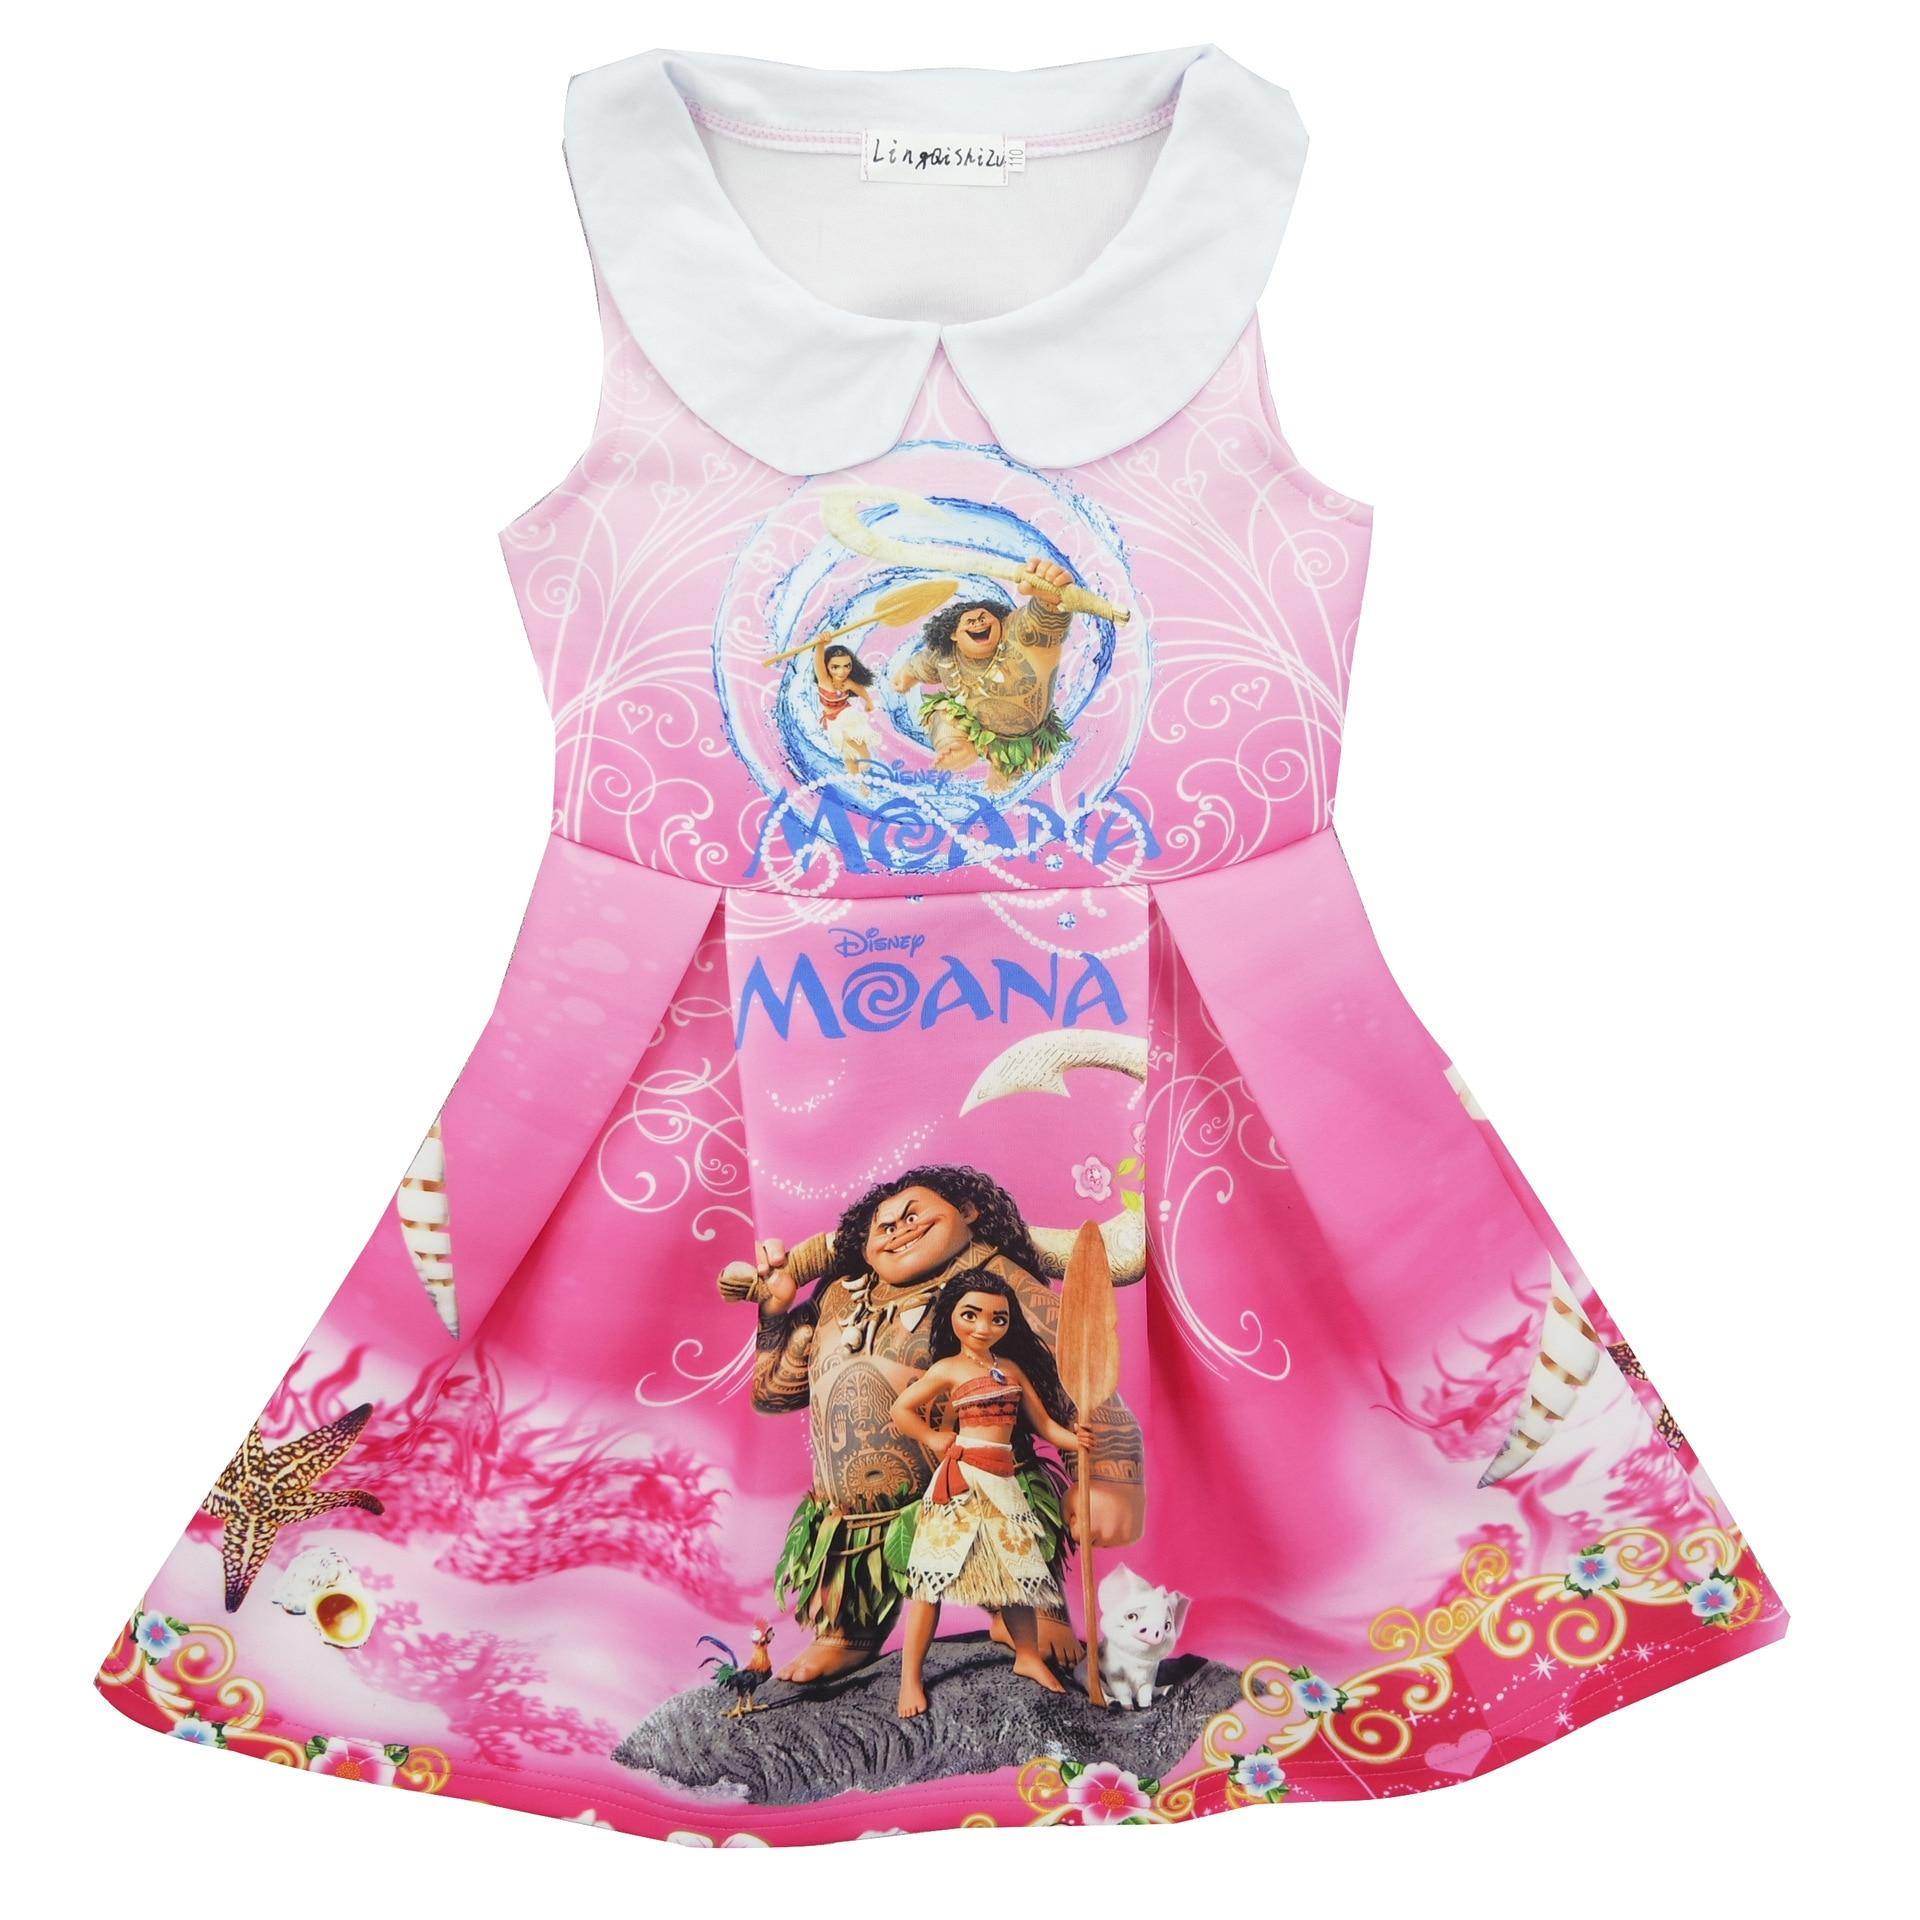 Baby Girls Dresses New 2018 Brand Summer Moana Dress Kids Clothes Vestido Princesa Character Children Vaiana Dress Mona Clothing